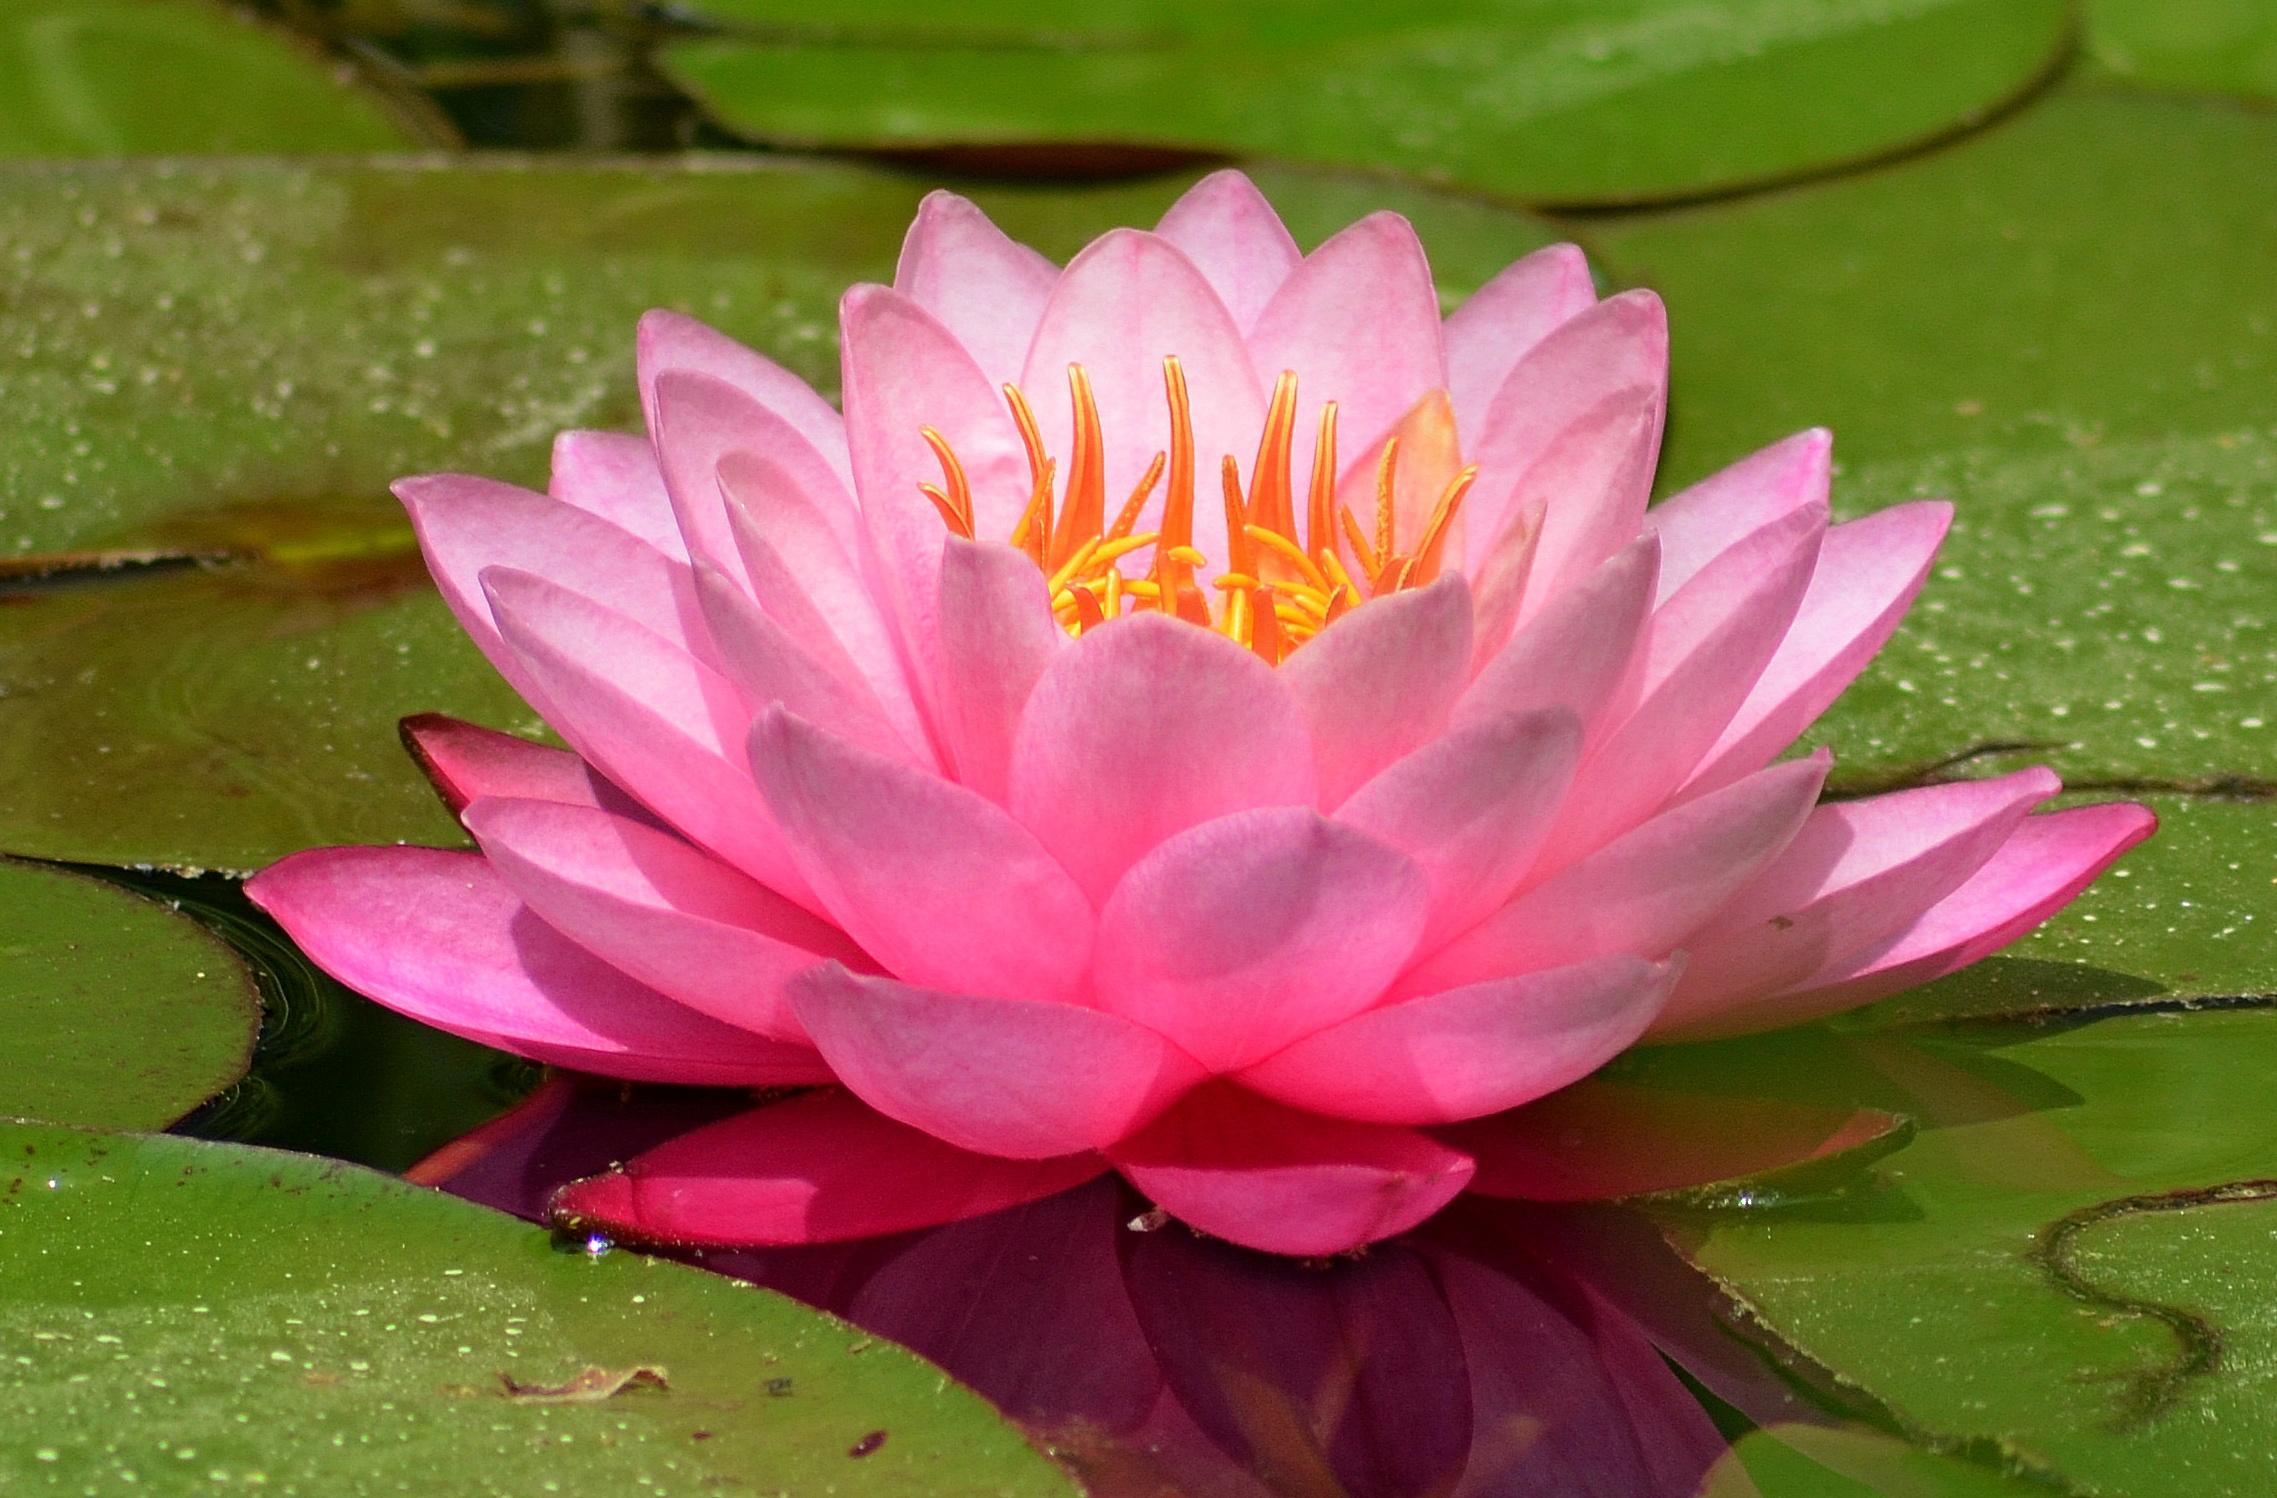 принципом кувшинки фото цветка ест рыбку